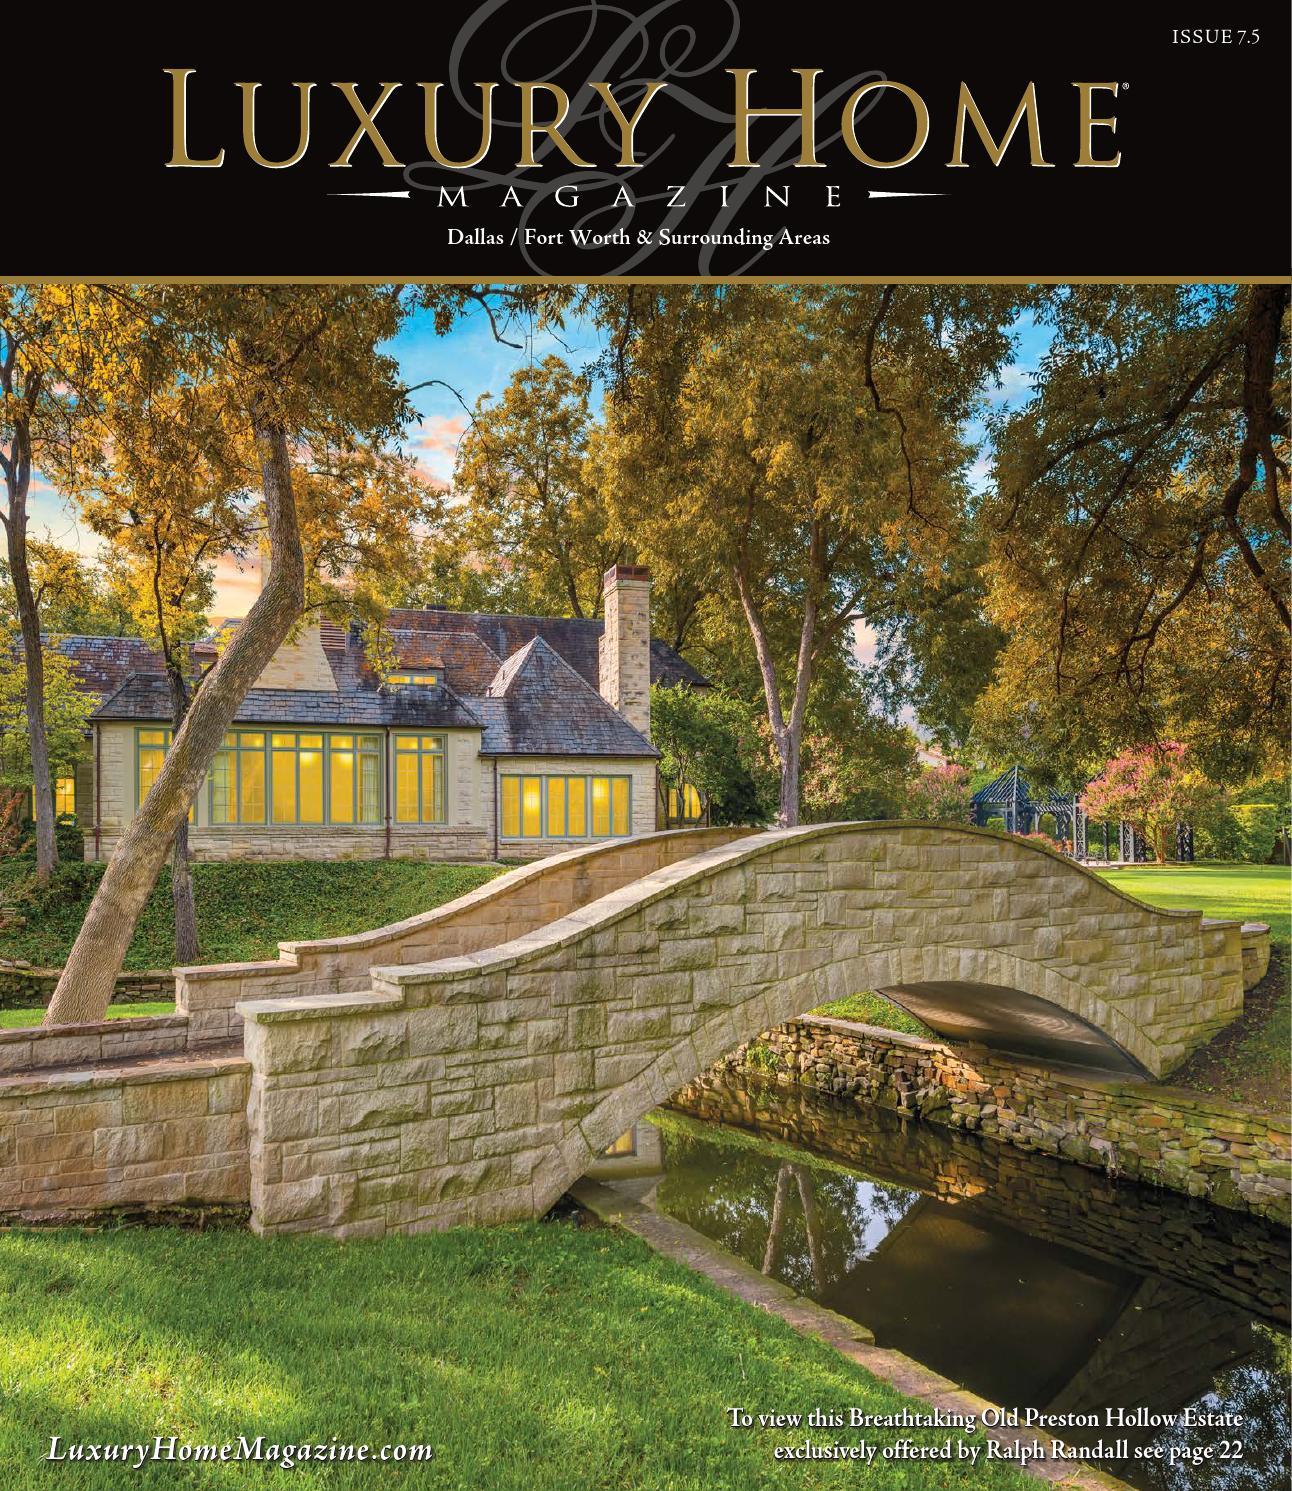 Luxury Residence By Dallas Design: Luxury Home Magazine Dallas